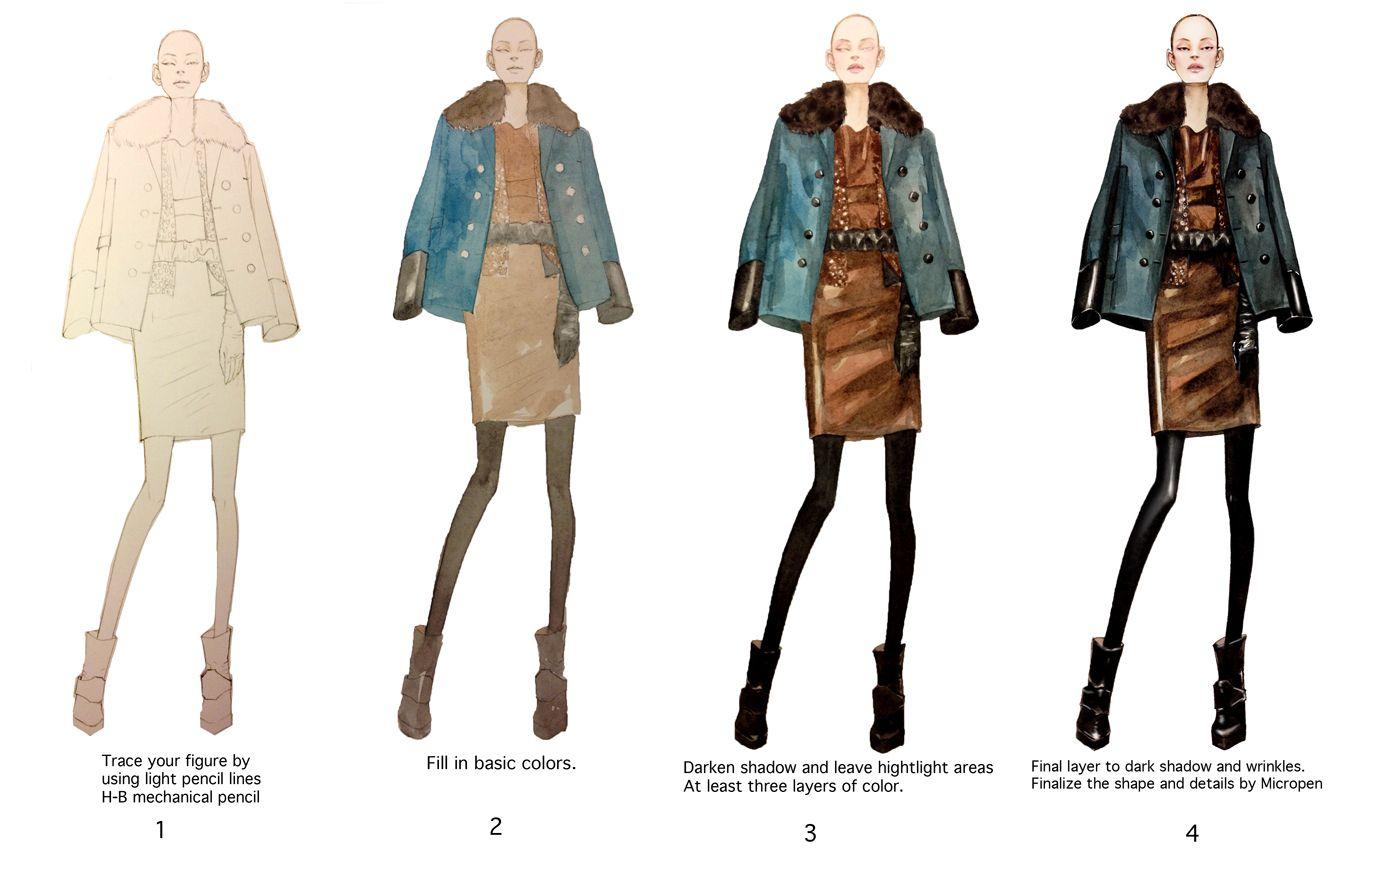 Fashion Illustrator Mengjie Di: Watercolor step by step